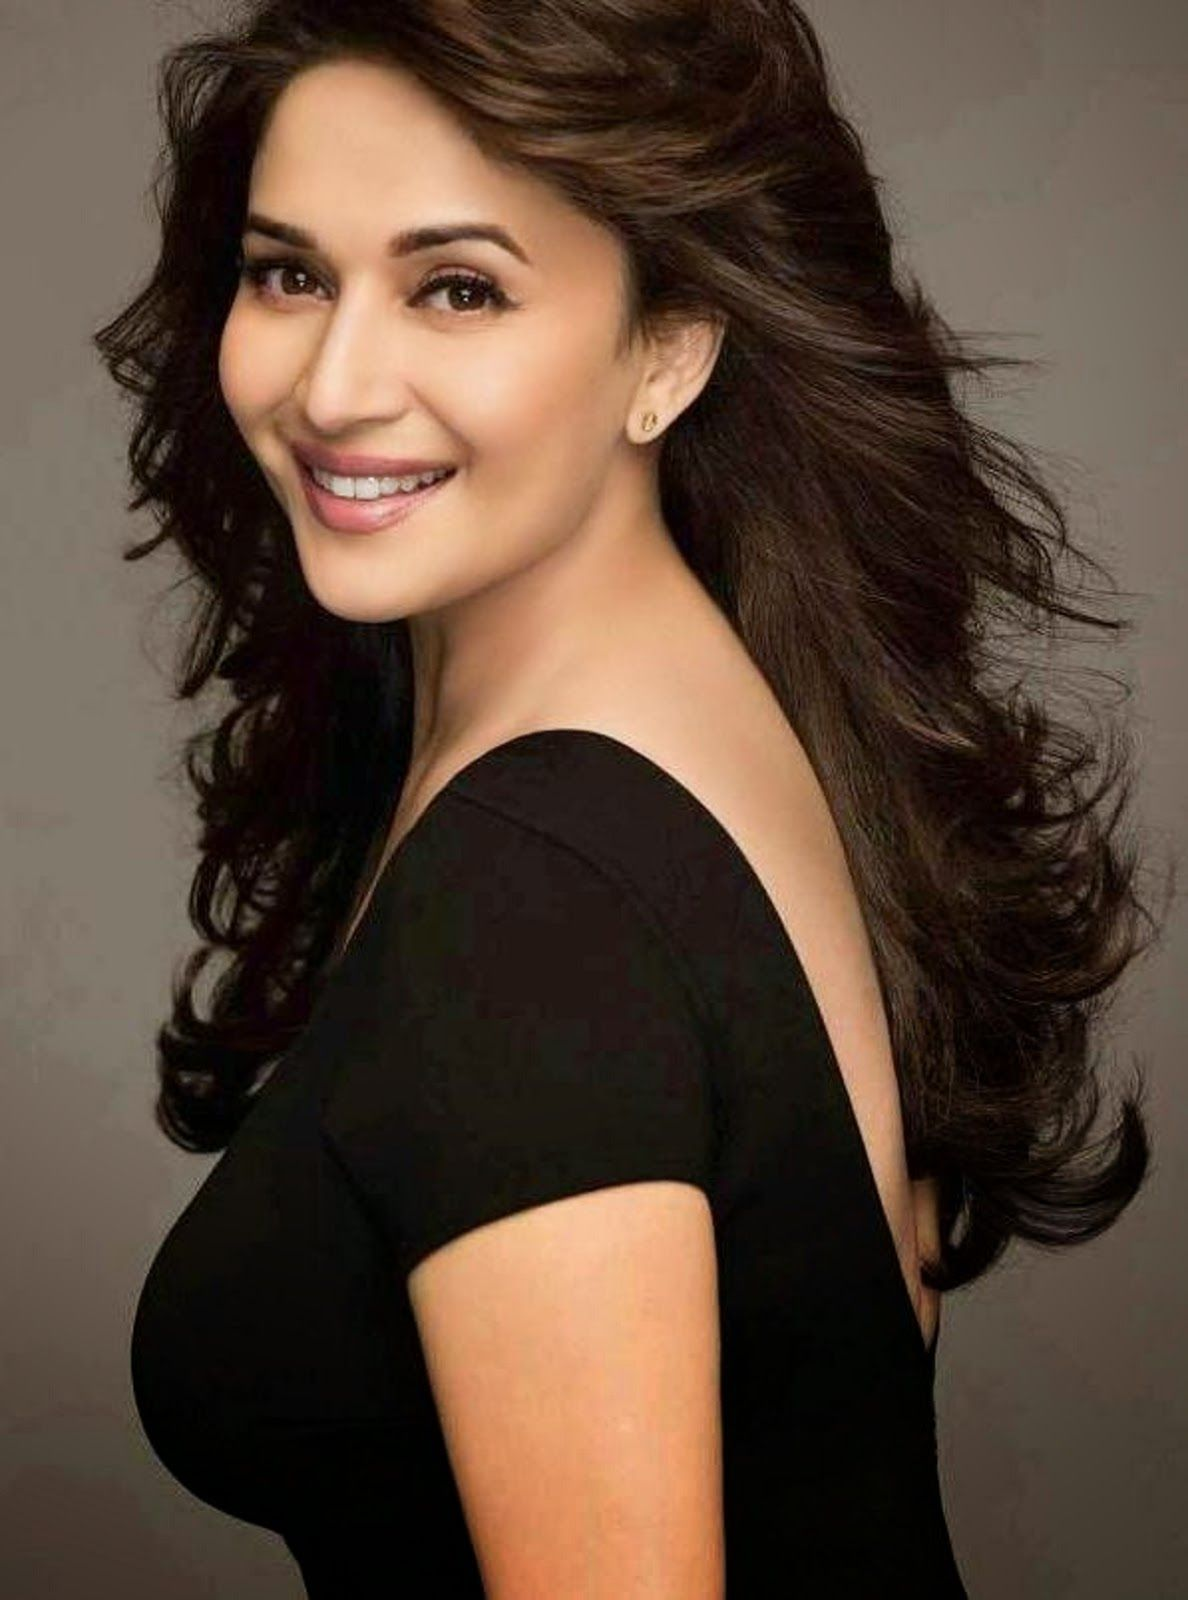 Wallpaper download madhuri dixit - Beautiful Madhuri Dixit Hd Wallpaper Madhuri Dixit Bollywood